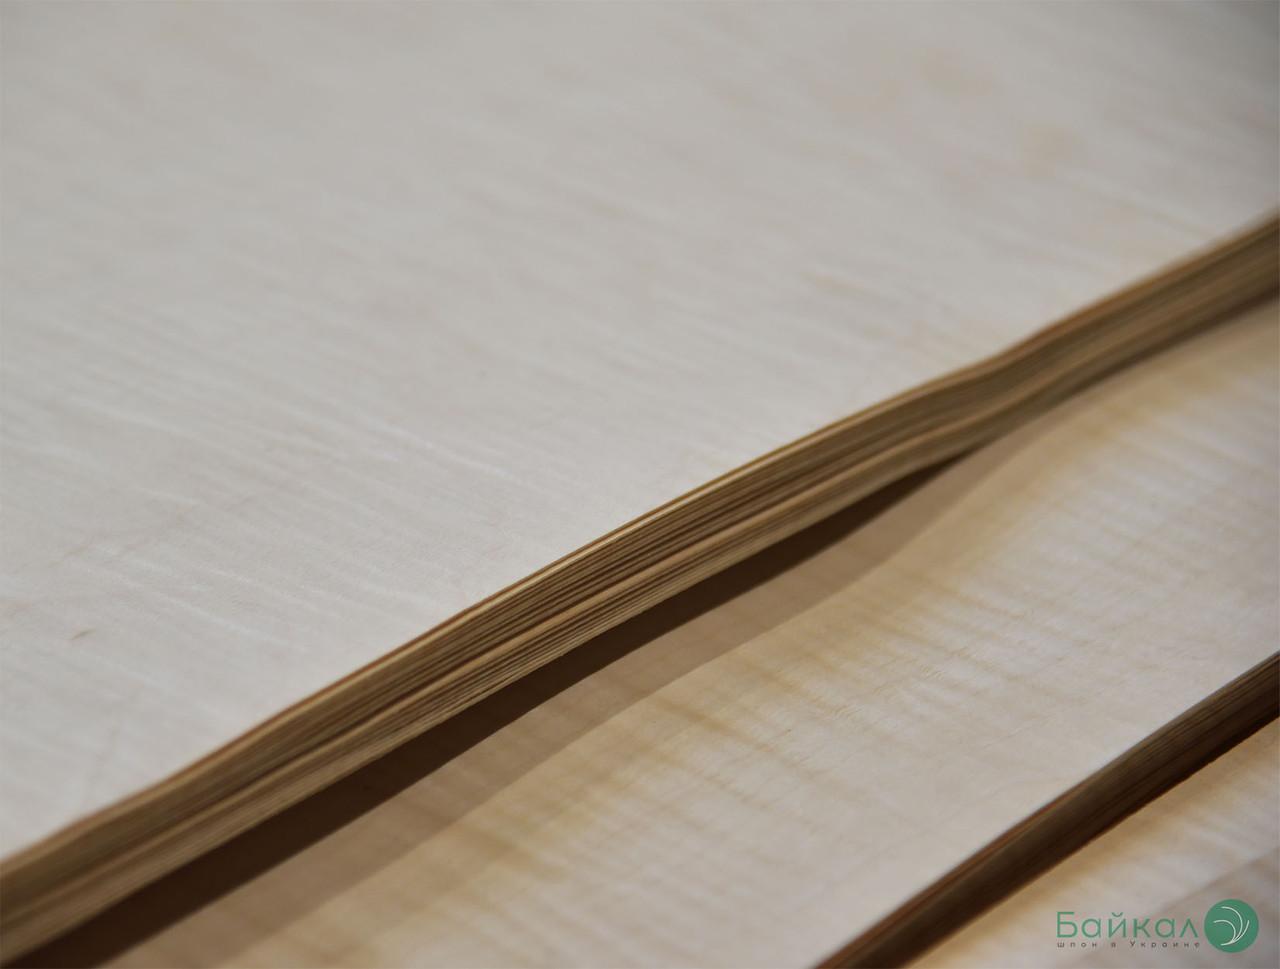 Шпон Клен Сікамора (натуральний) 0,55 мм АВ сорт - 2,10 м+/10 см+